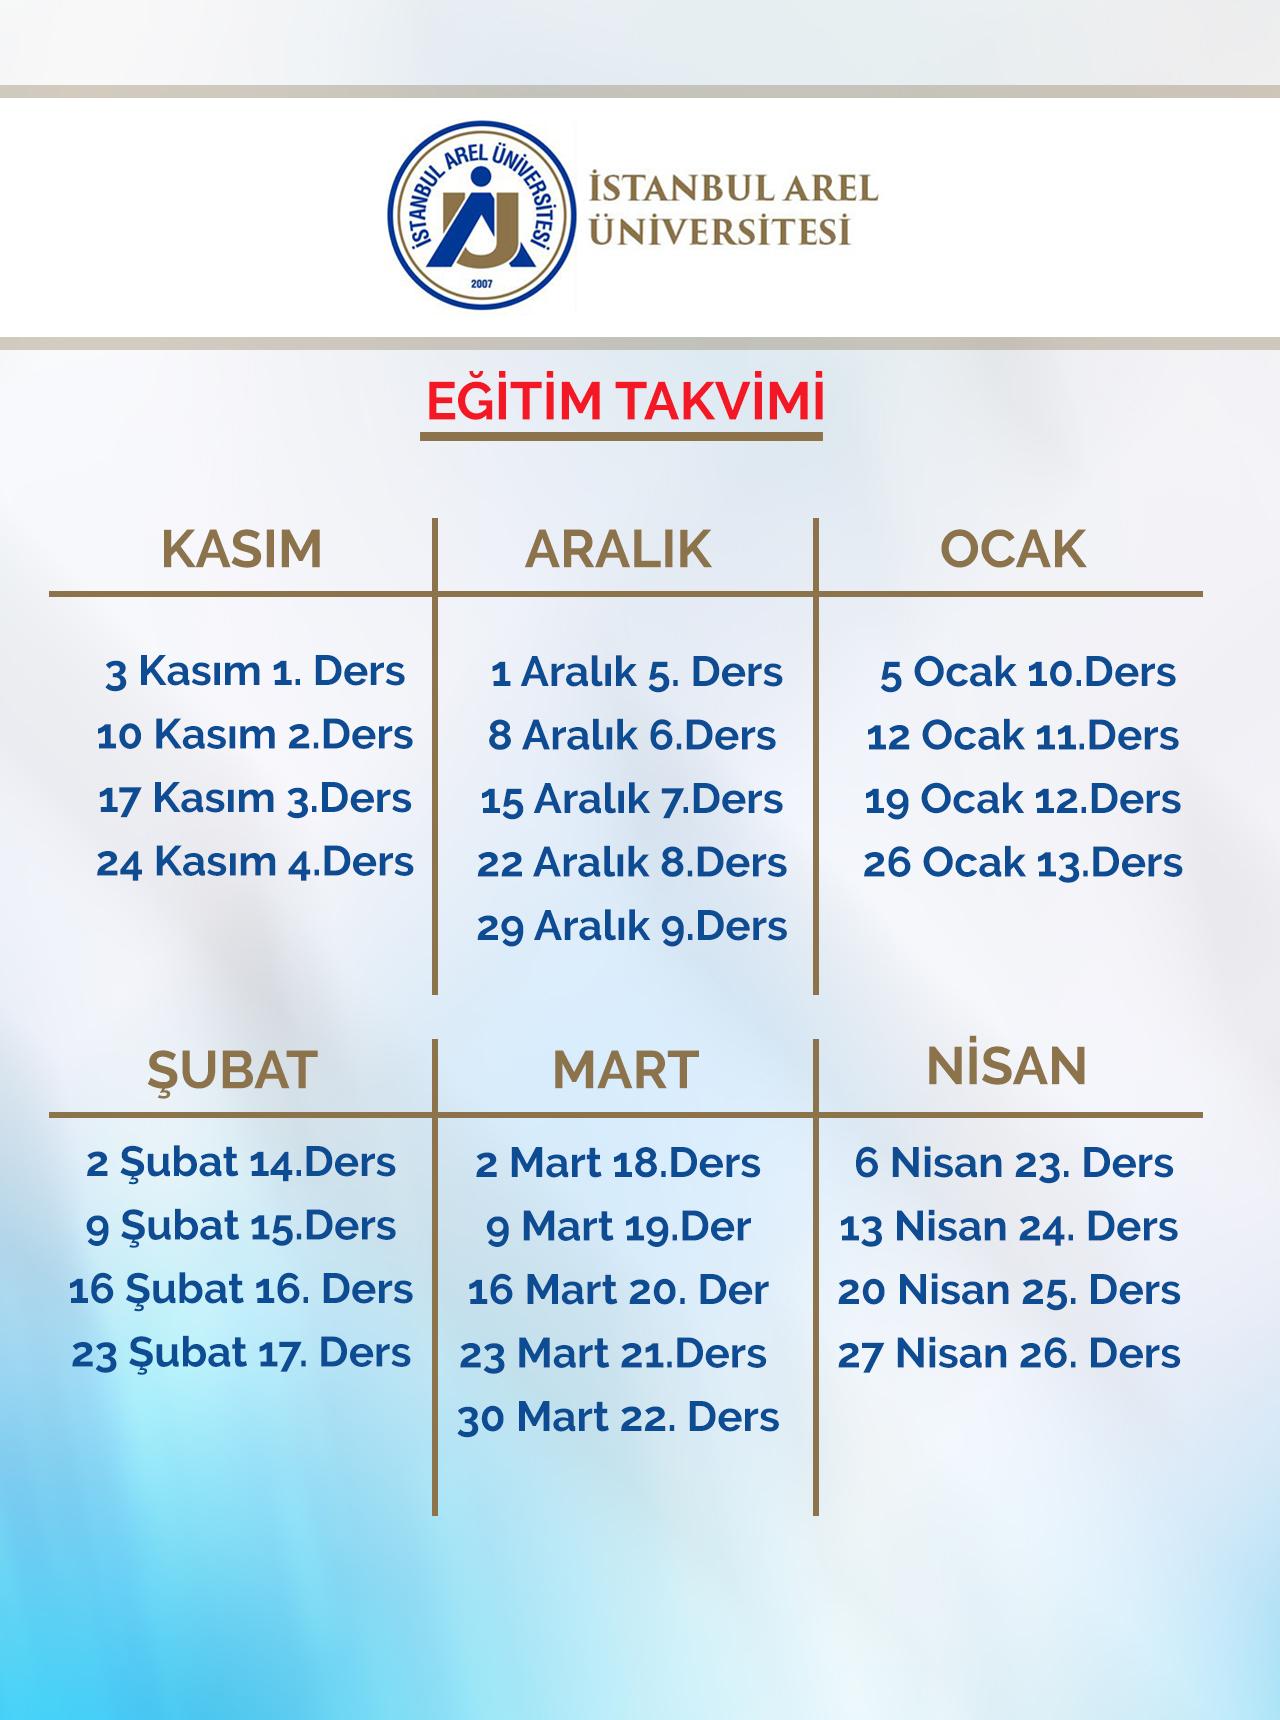 Istanbul Arel Üniversitesi Faaliyet Takvimi